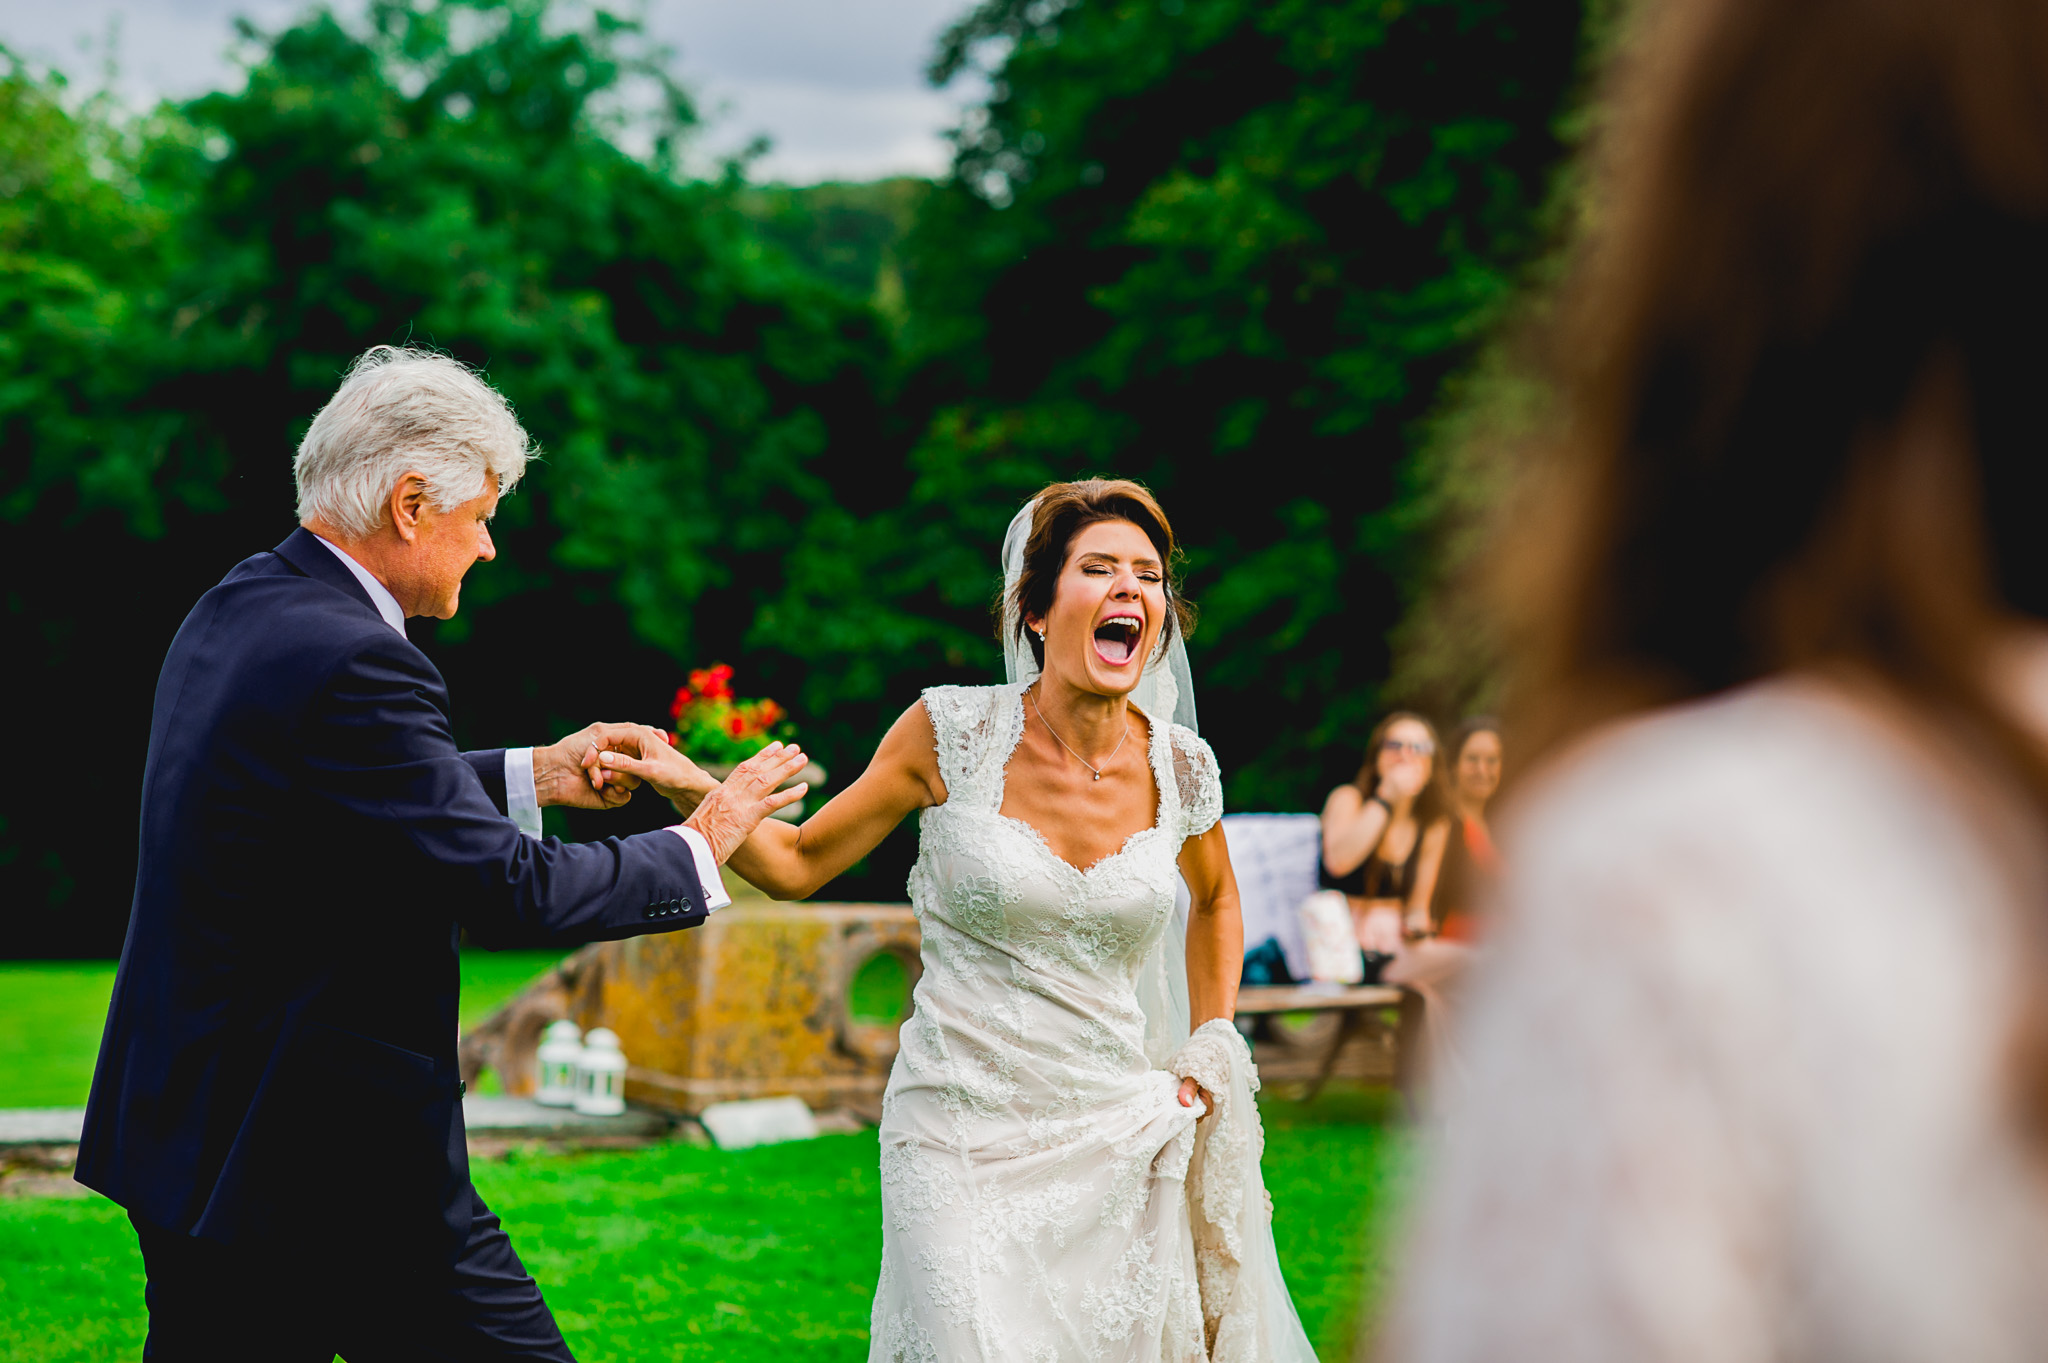 Lara & Jack Wedding 220815 by Barney Walters_683_BW3_7060